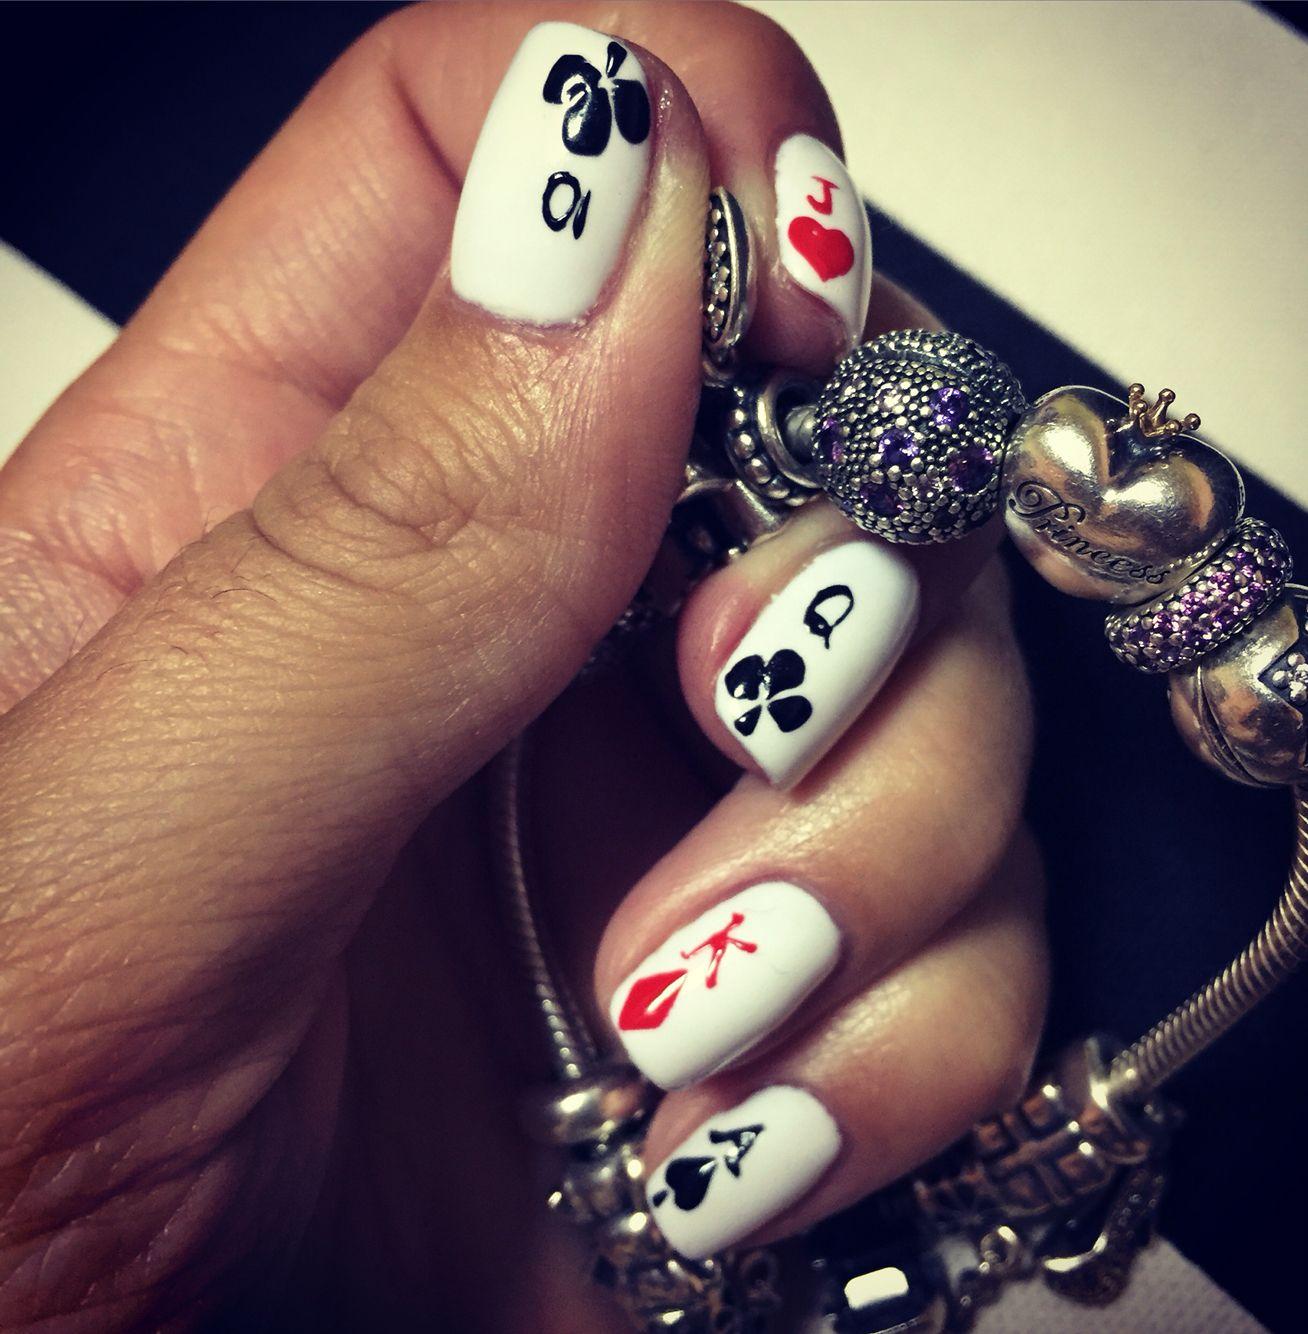 Playing cards ... Poker, Casino ❤ ♧ ♢ ♤ | Nails design/Art ...